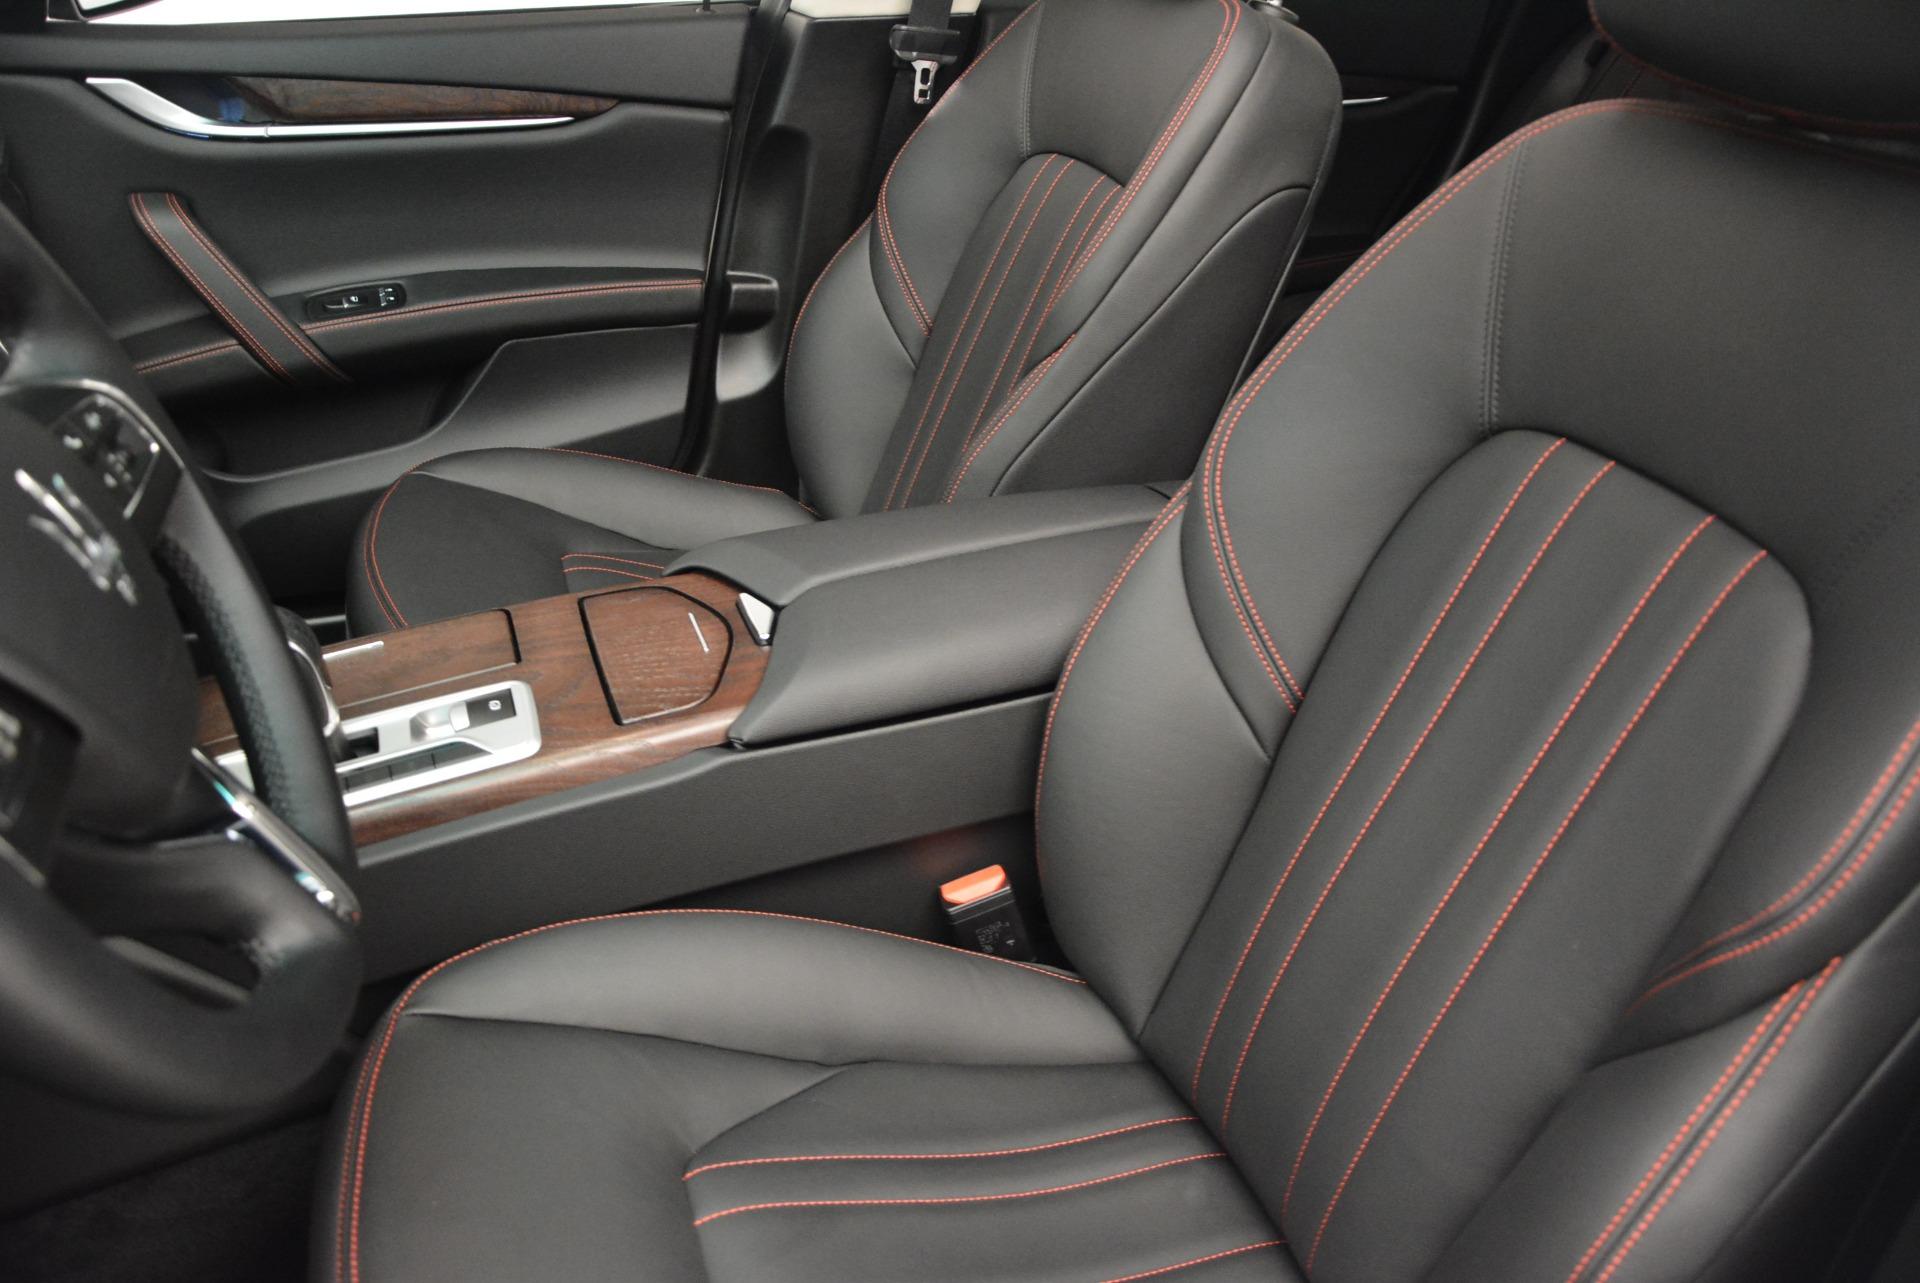 Used 2015 Maserati Ghibli S Q4 For Sale In Westport, CT 2070_p14